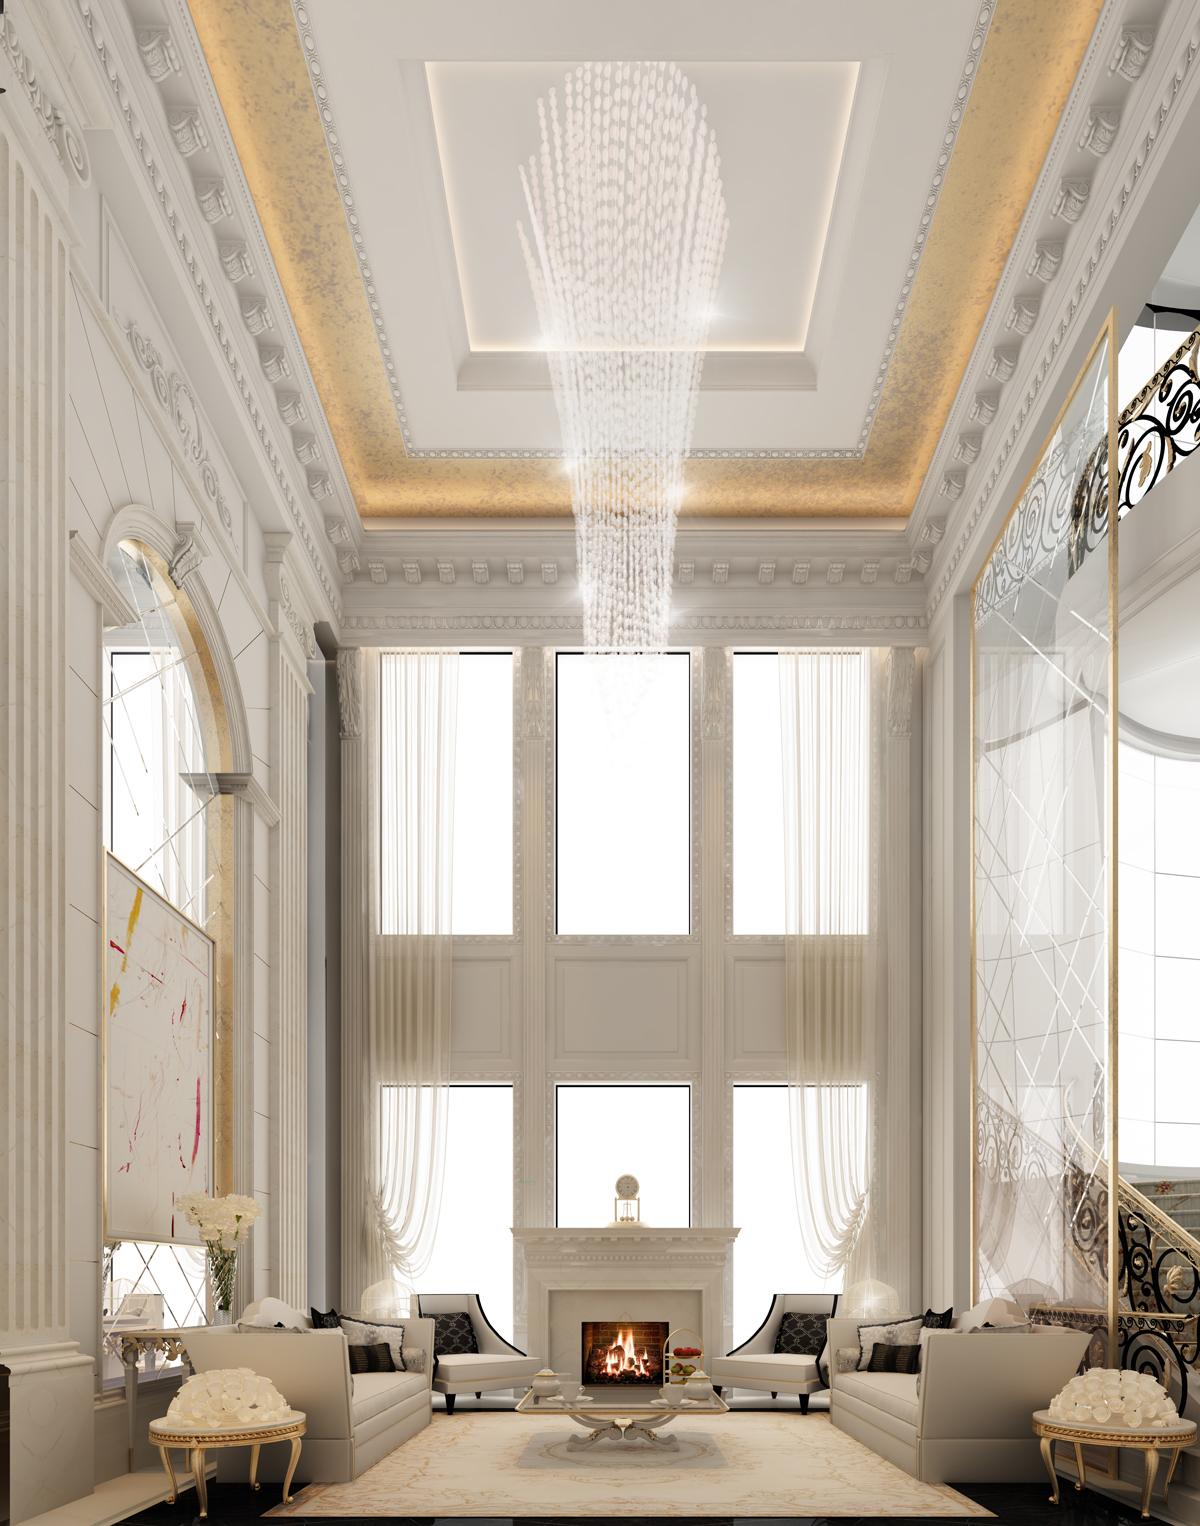 Top Interior Designer of Fab Homes